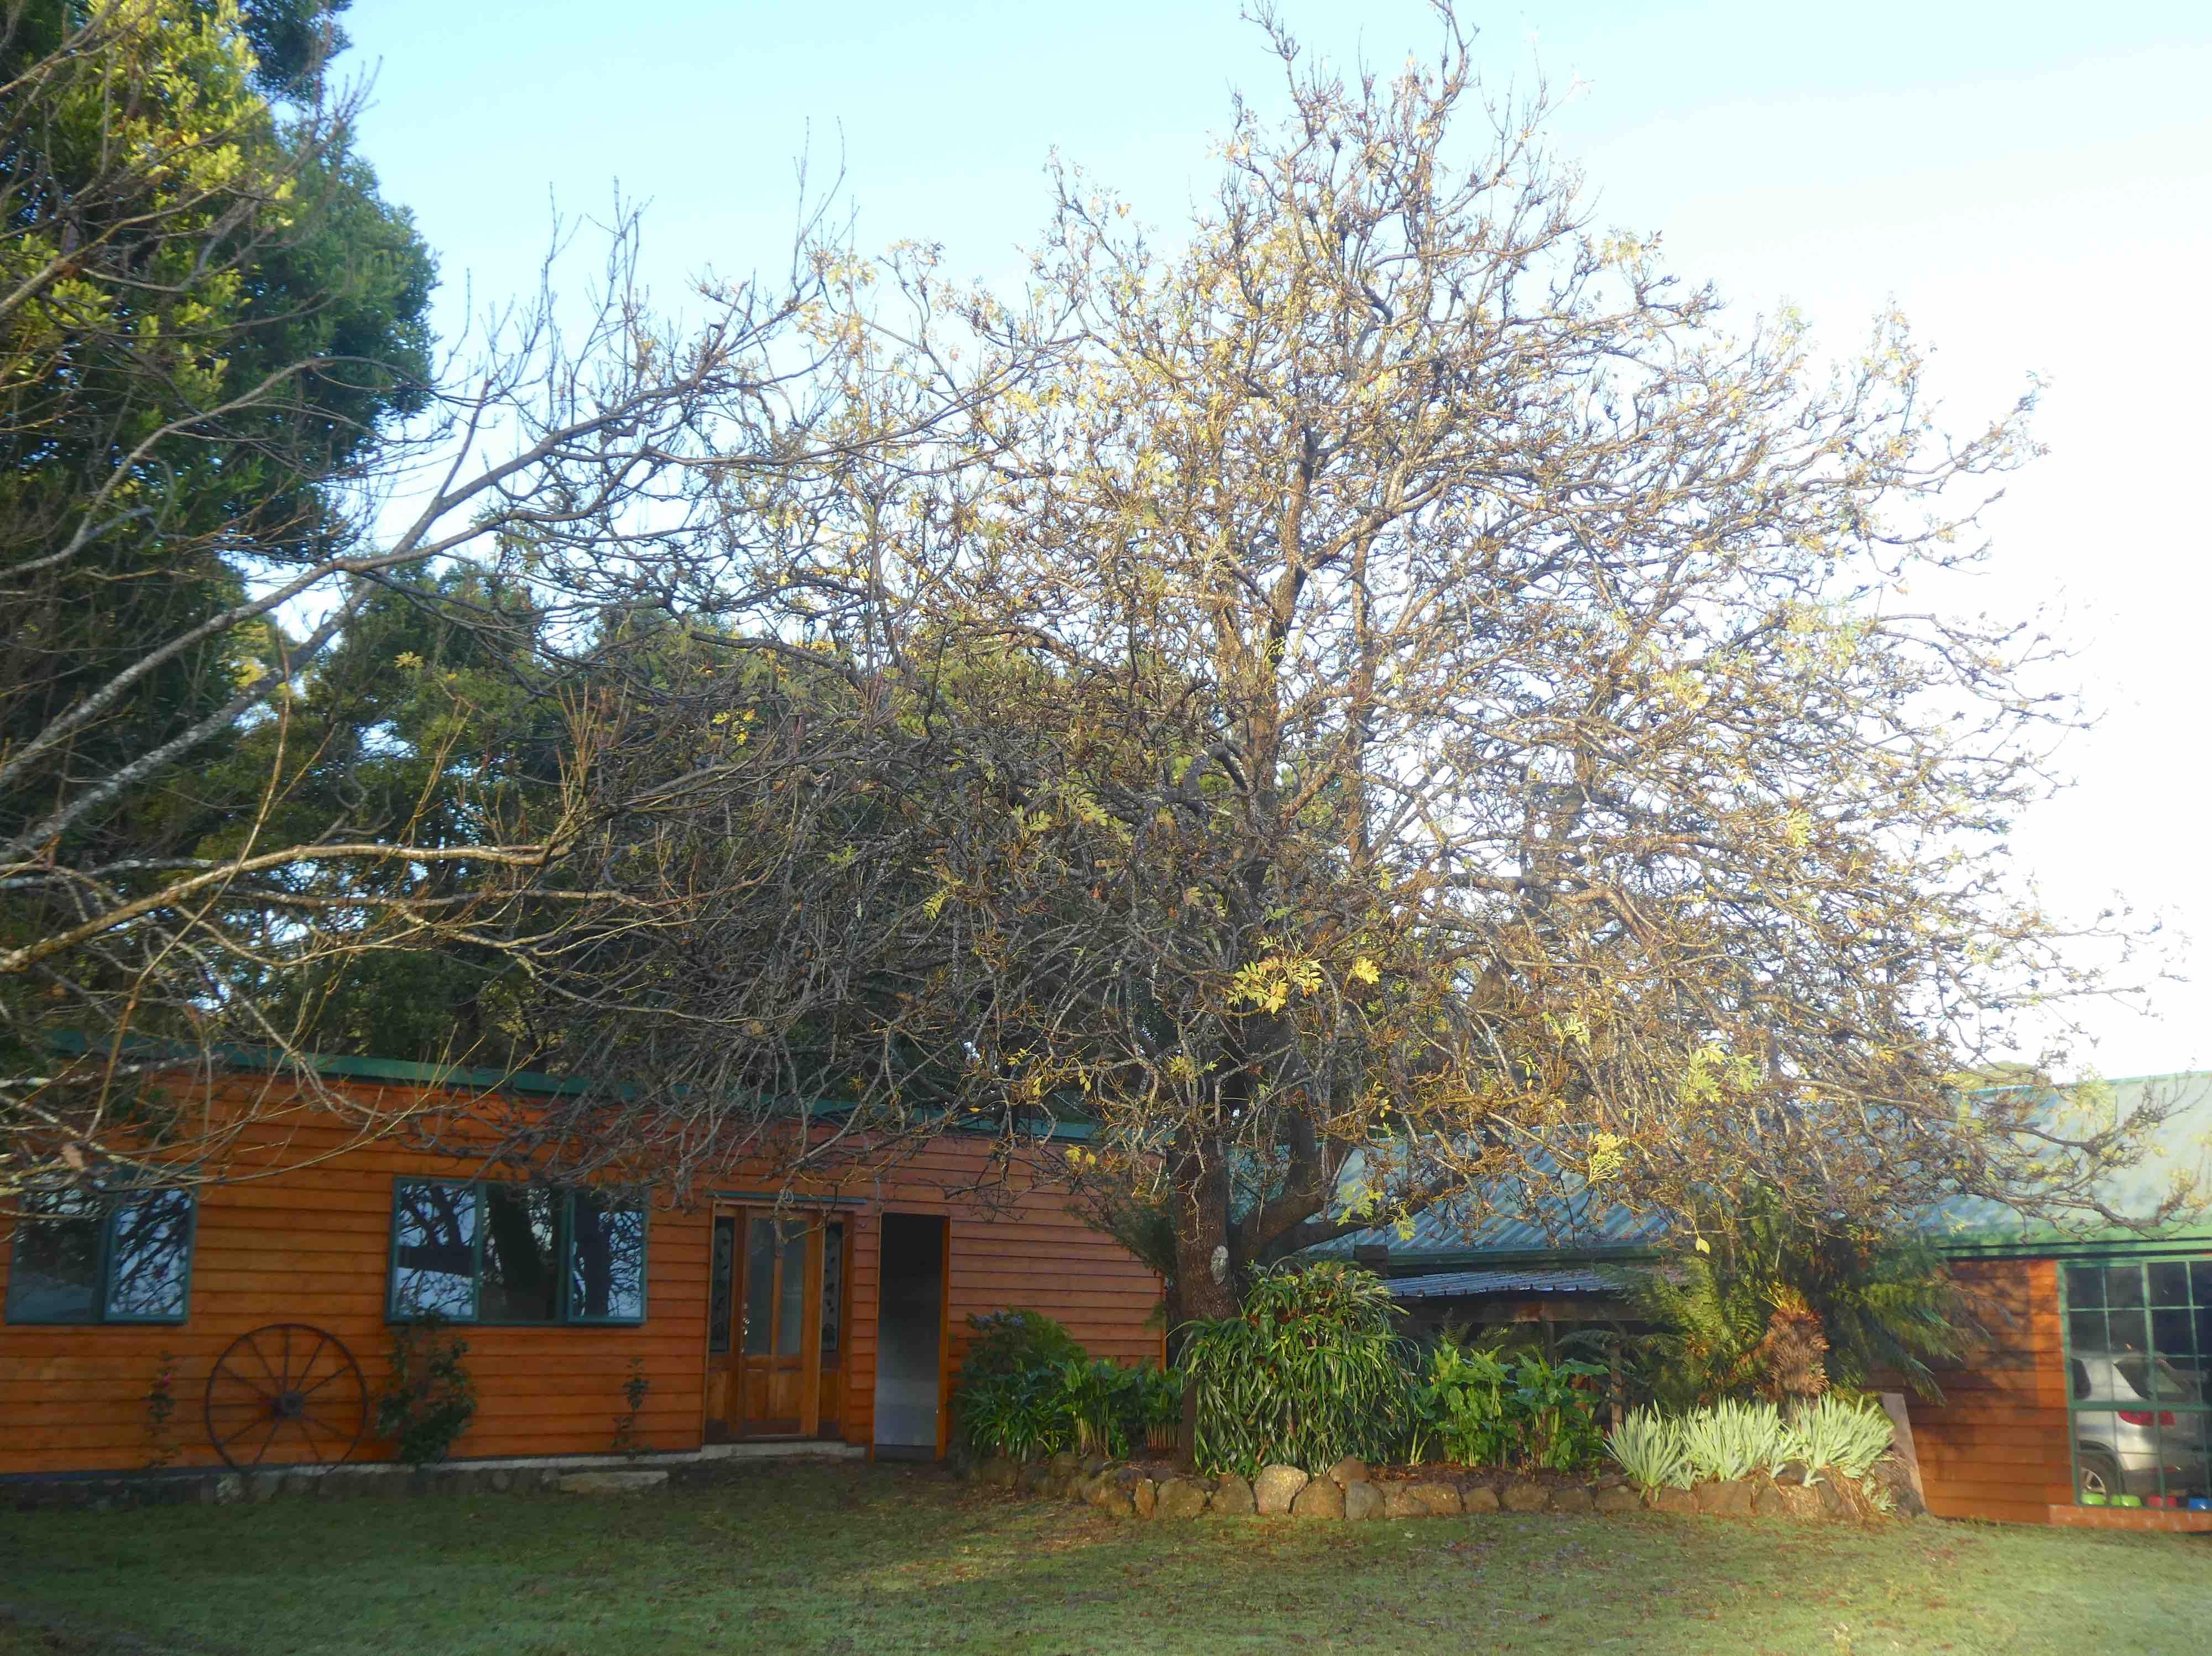 18.Ash tree